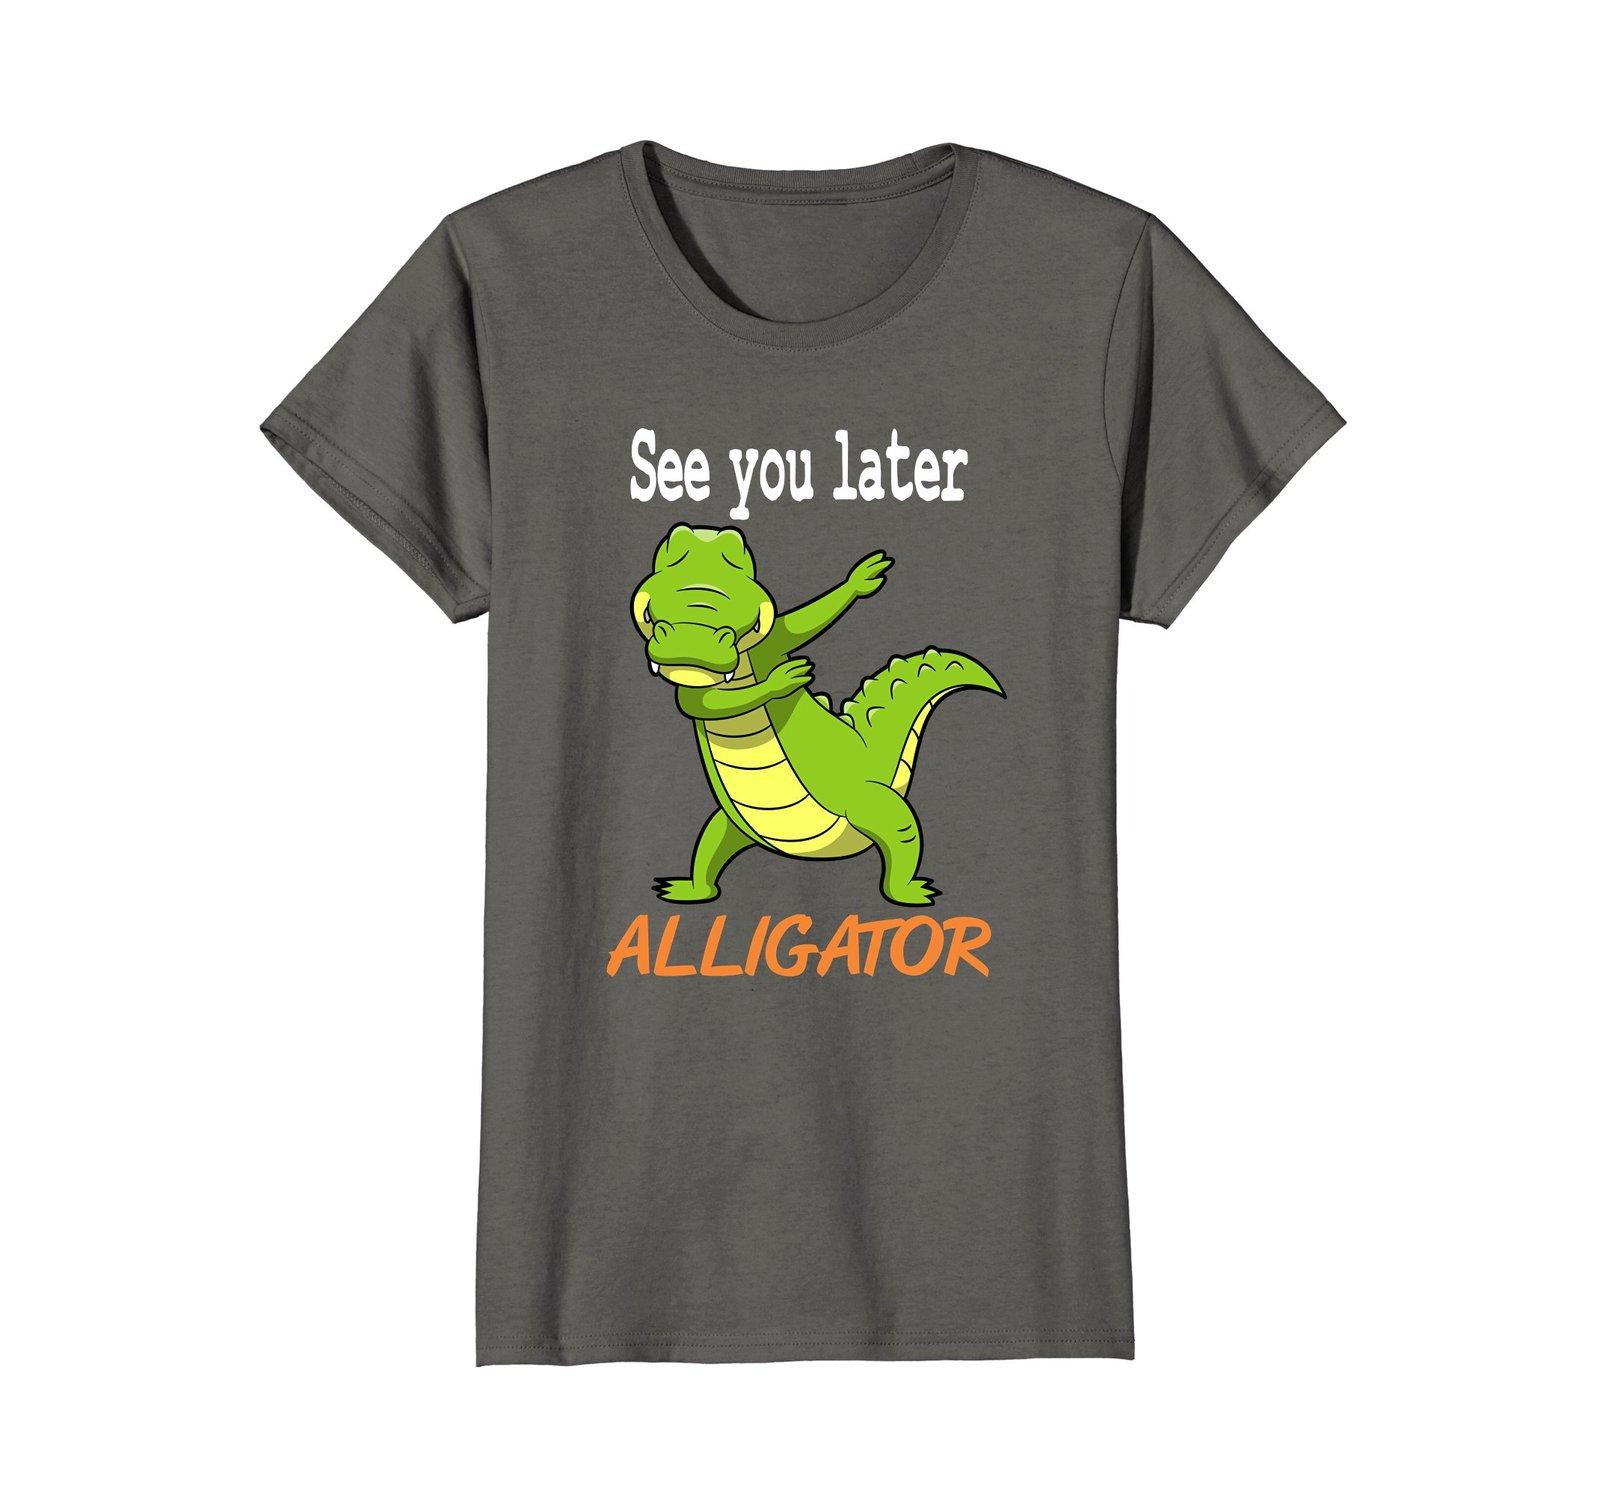 Crocodile Shirt - See you later Alligator Shirt Gift Idea